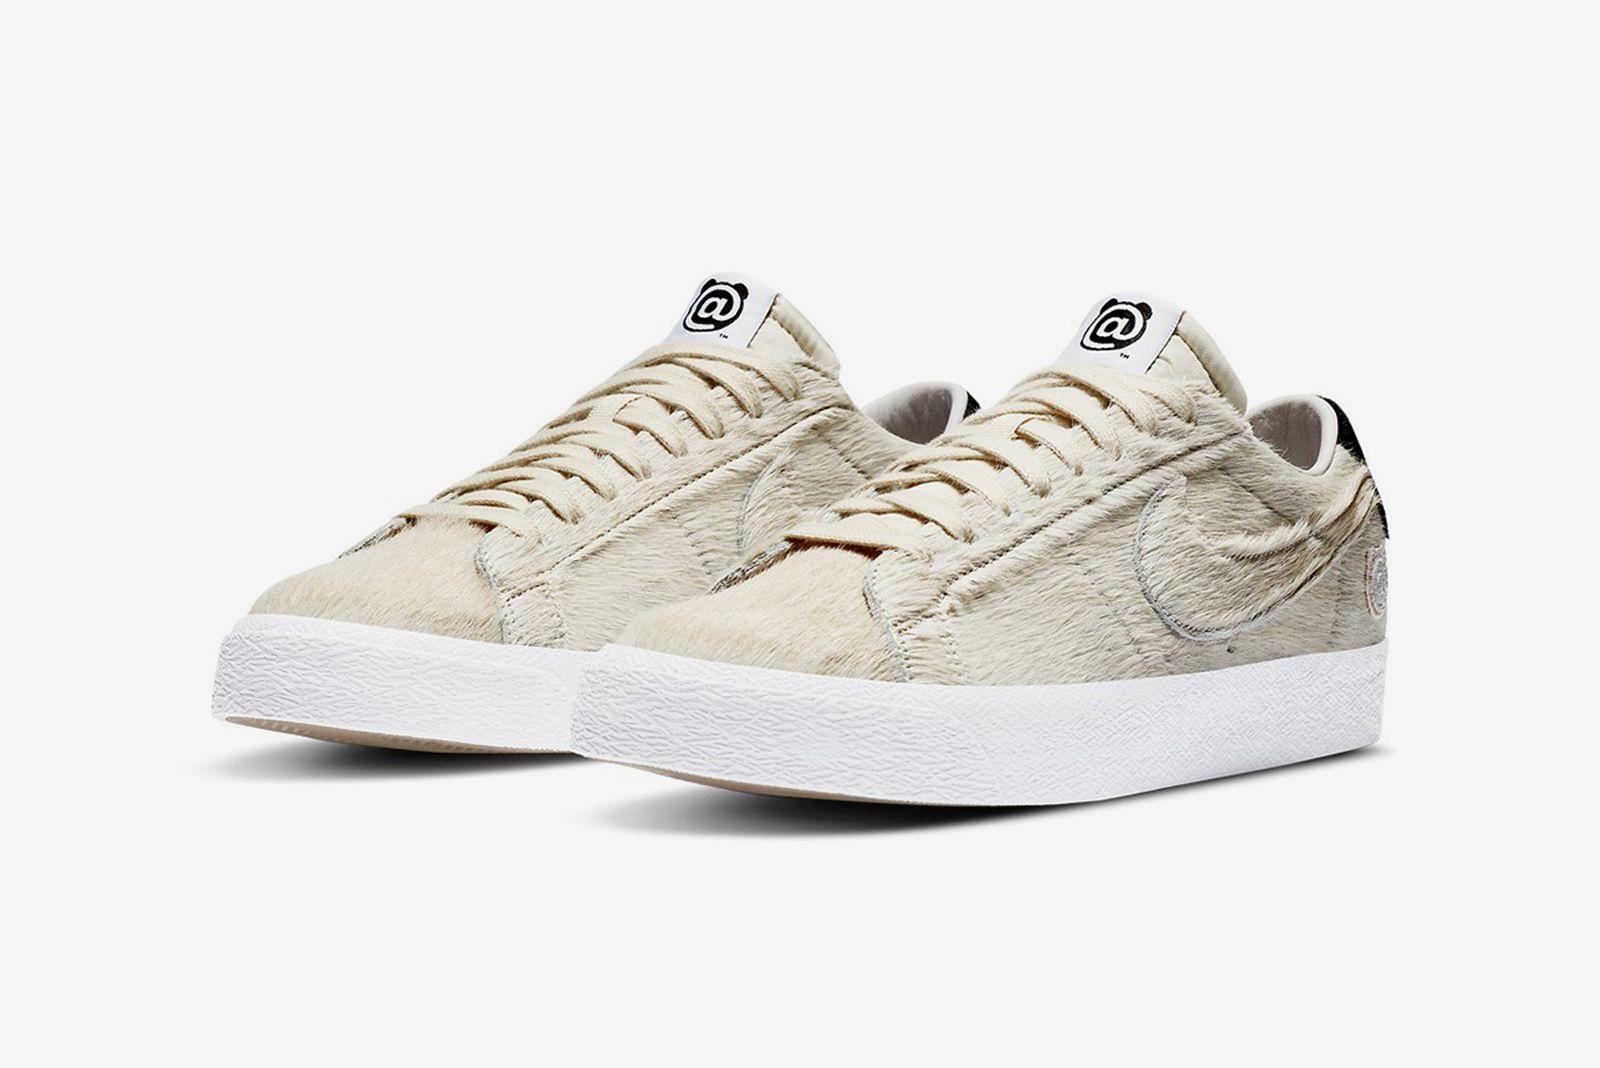 Medicom Toy x Nike SB Blazer Low: Official Images & Release Info